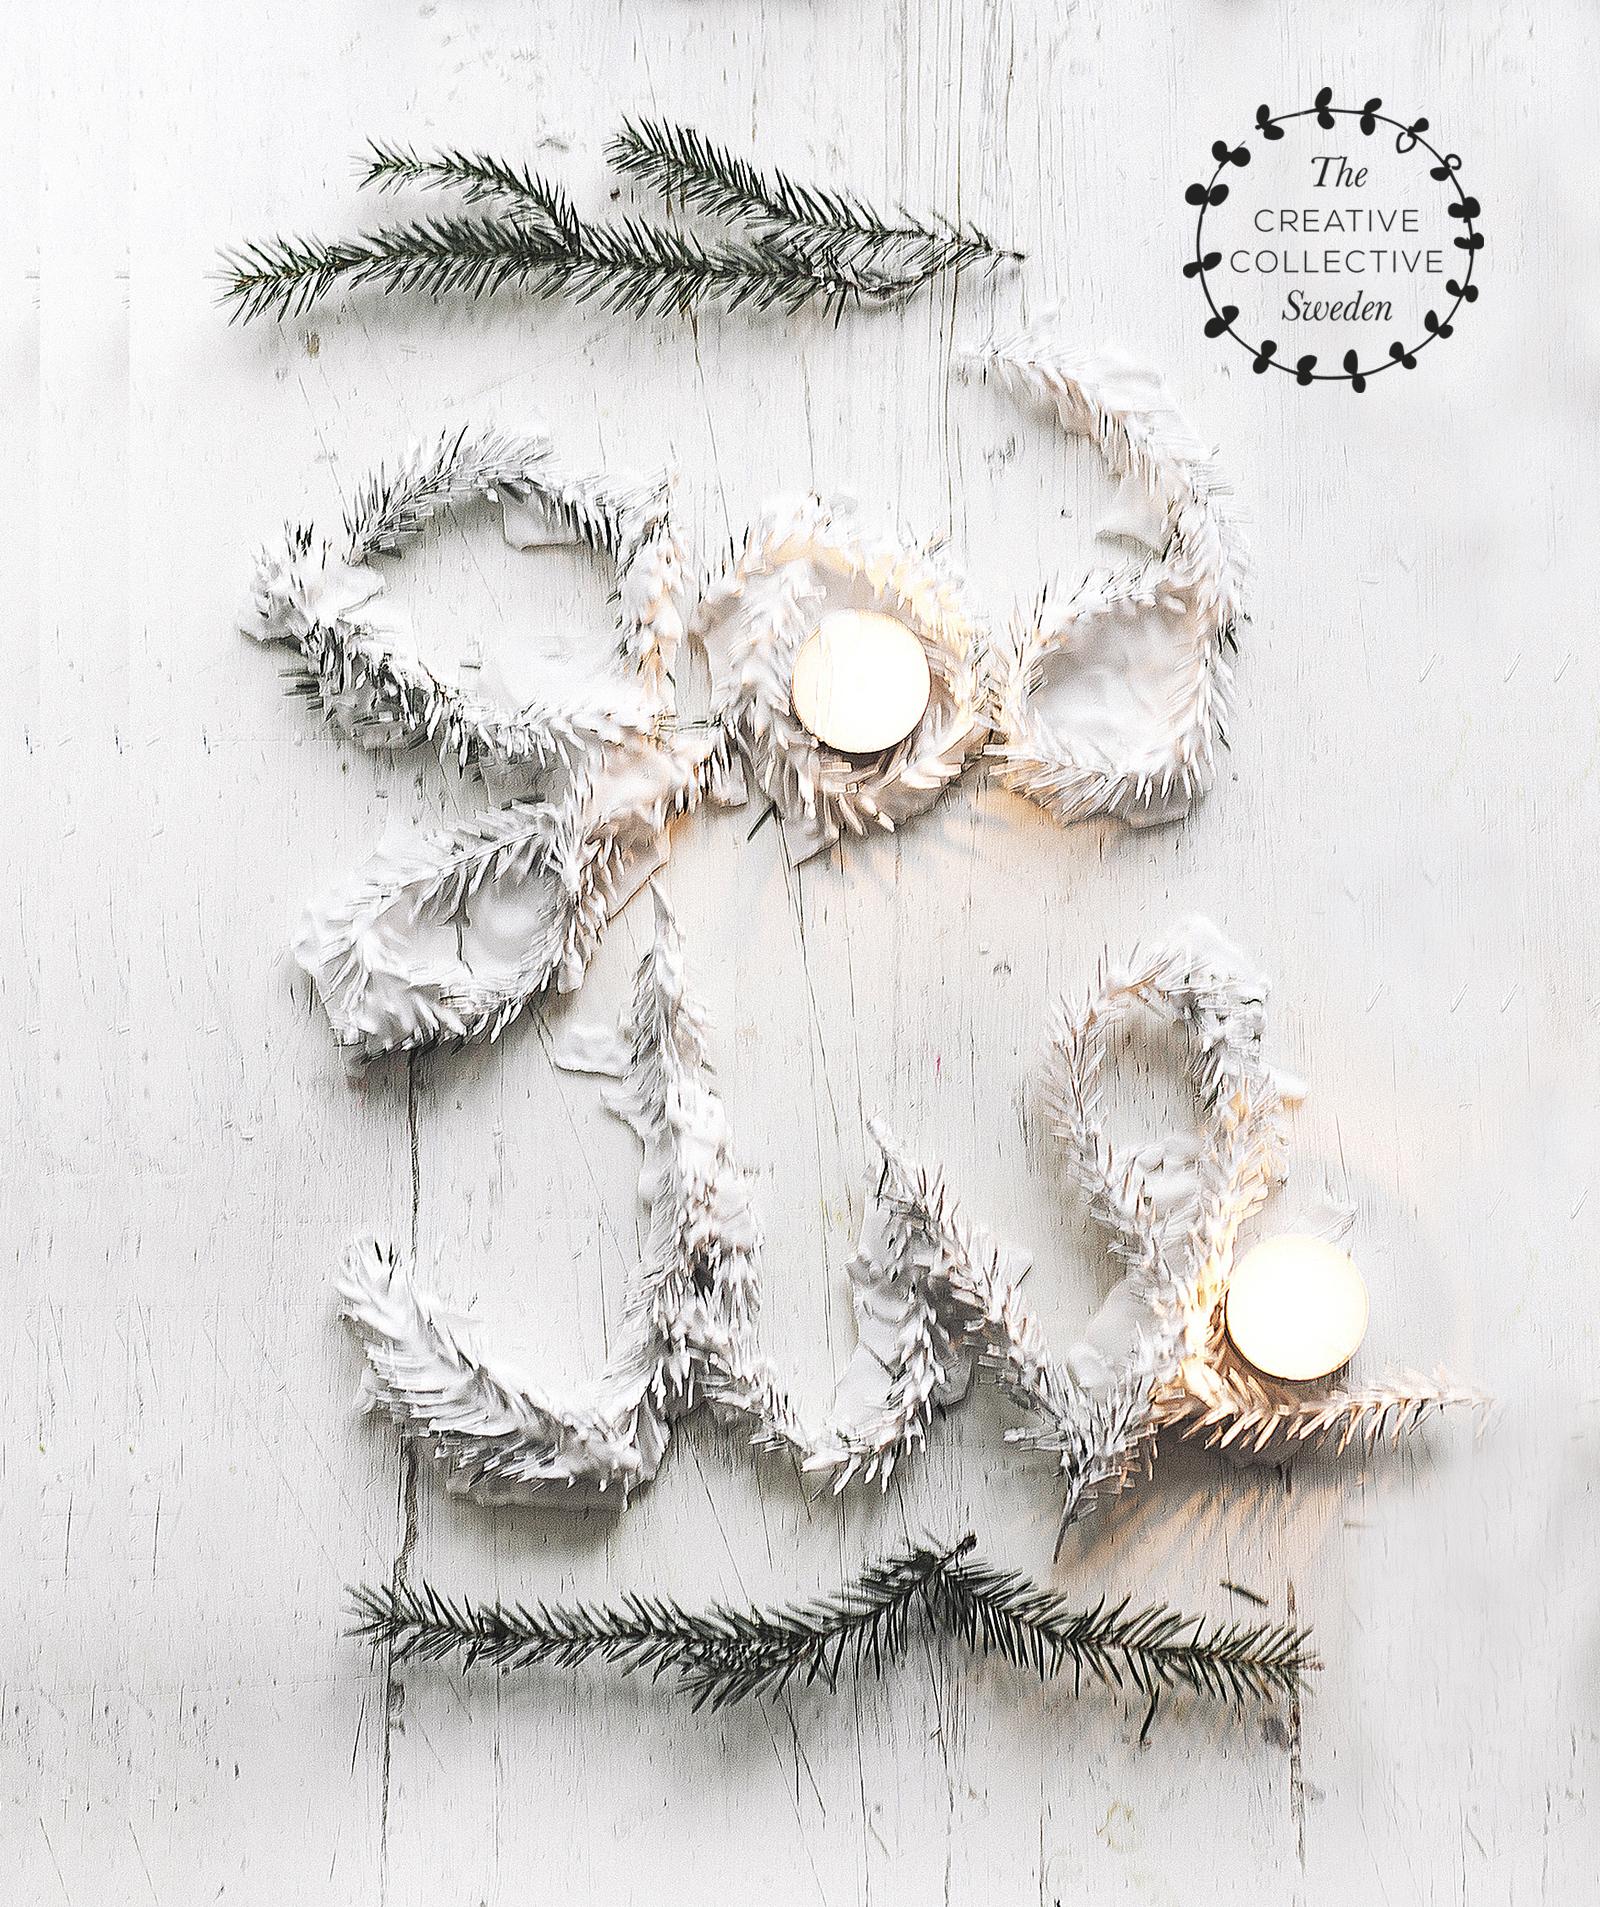 LOGO Dec1 Plaster WreathGJ_